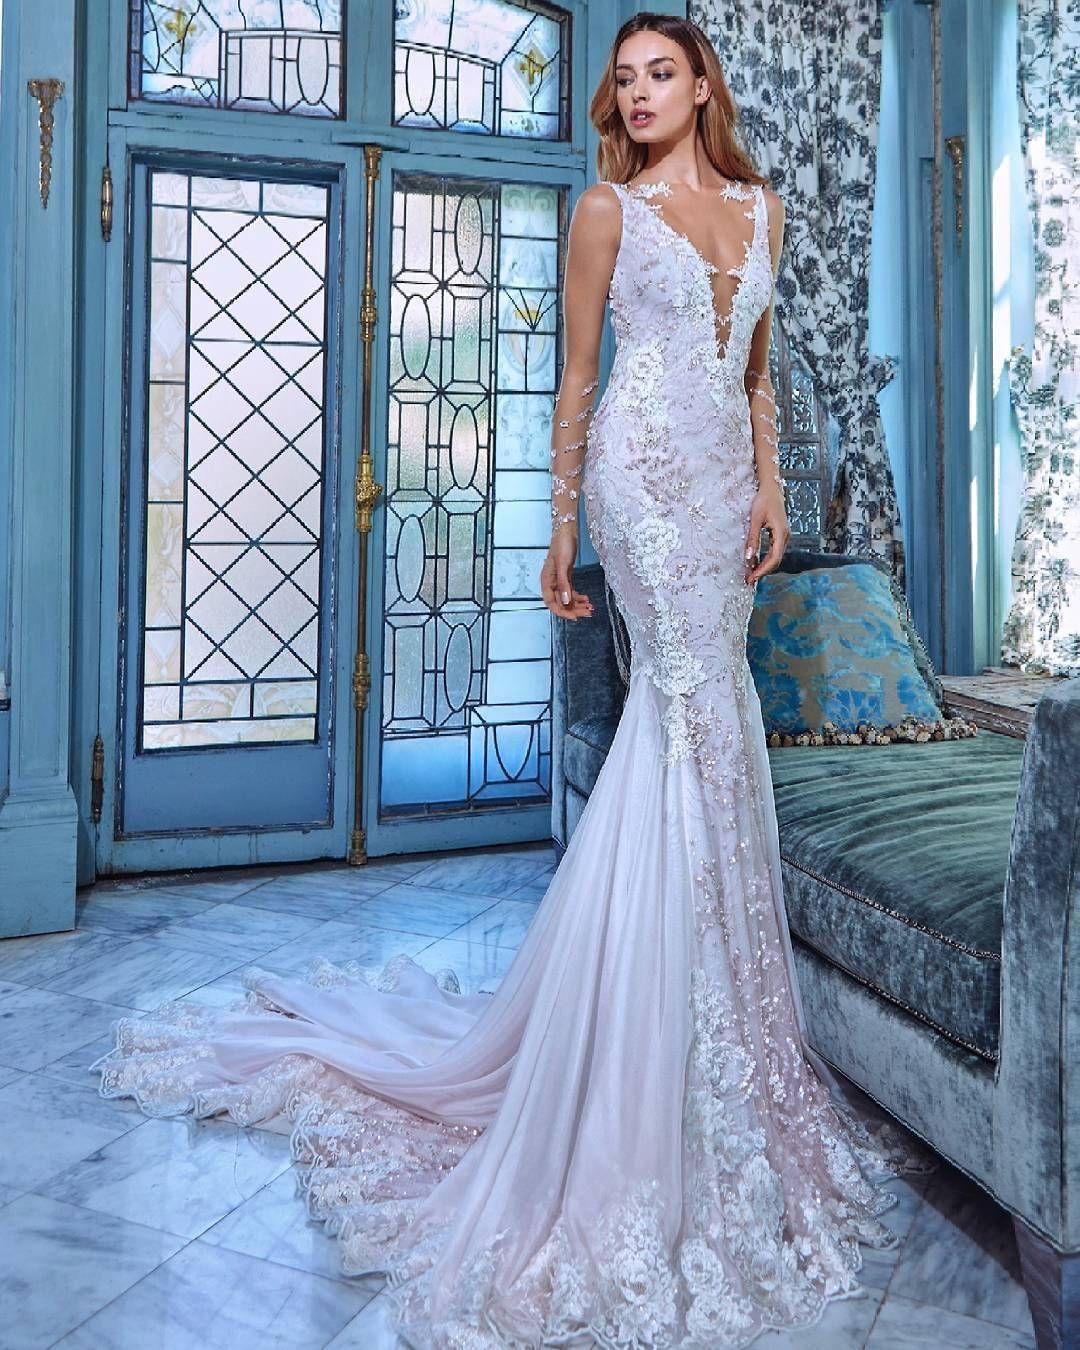 Unusual Wedding Dress Shops In Leeds Gallery - Wedding Ideas ...